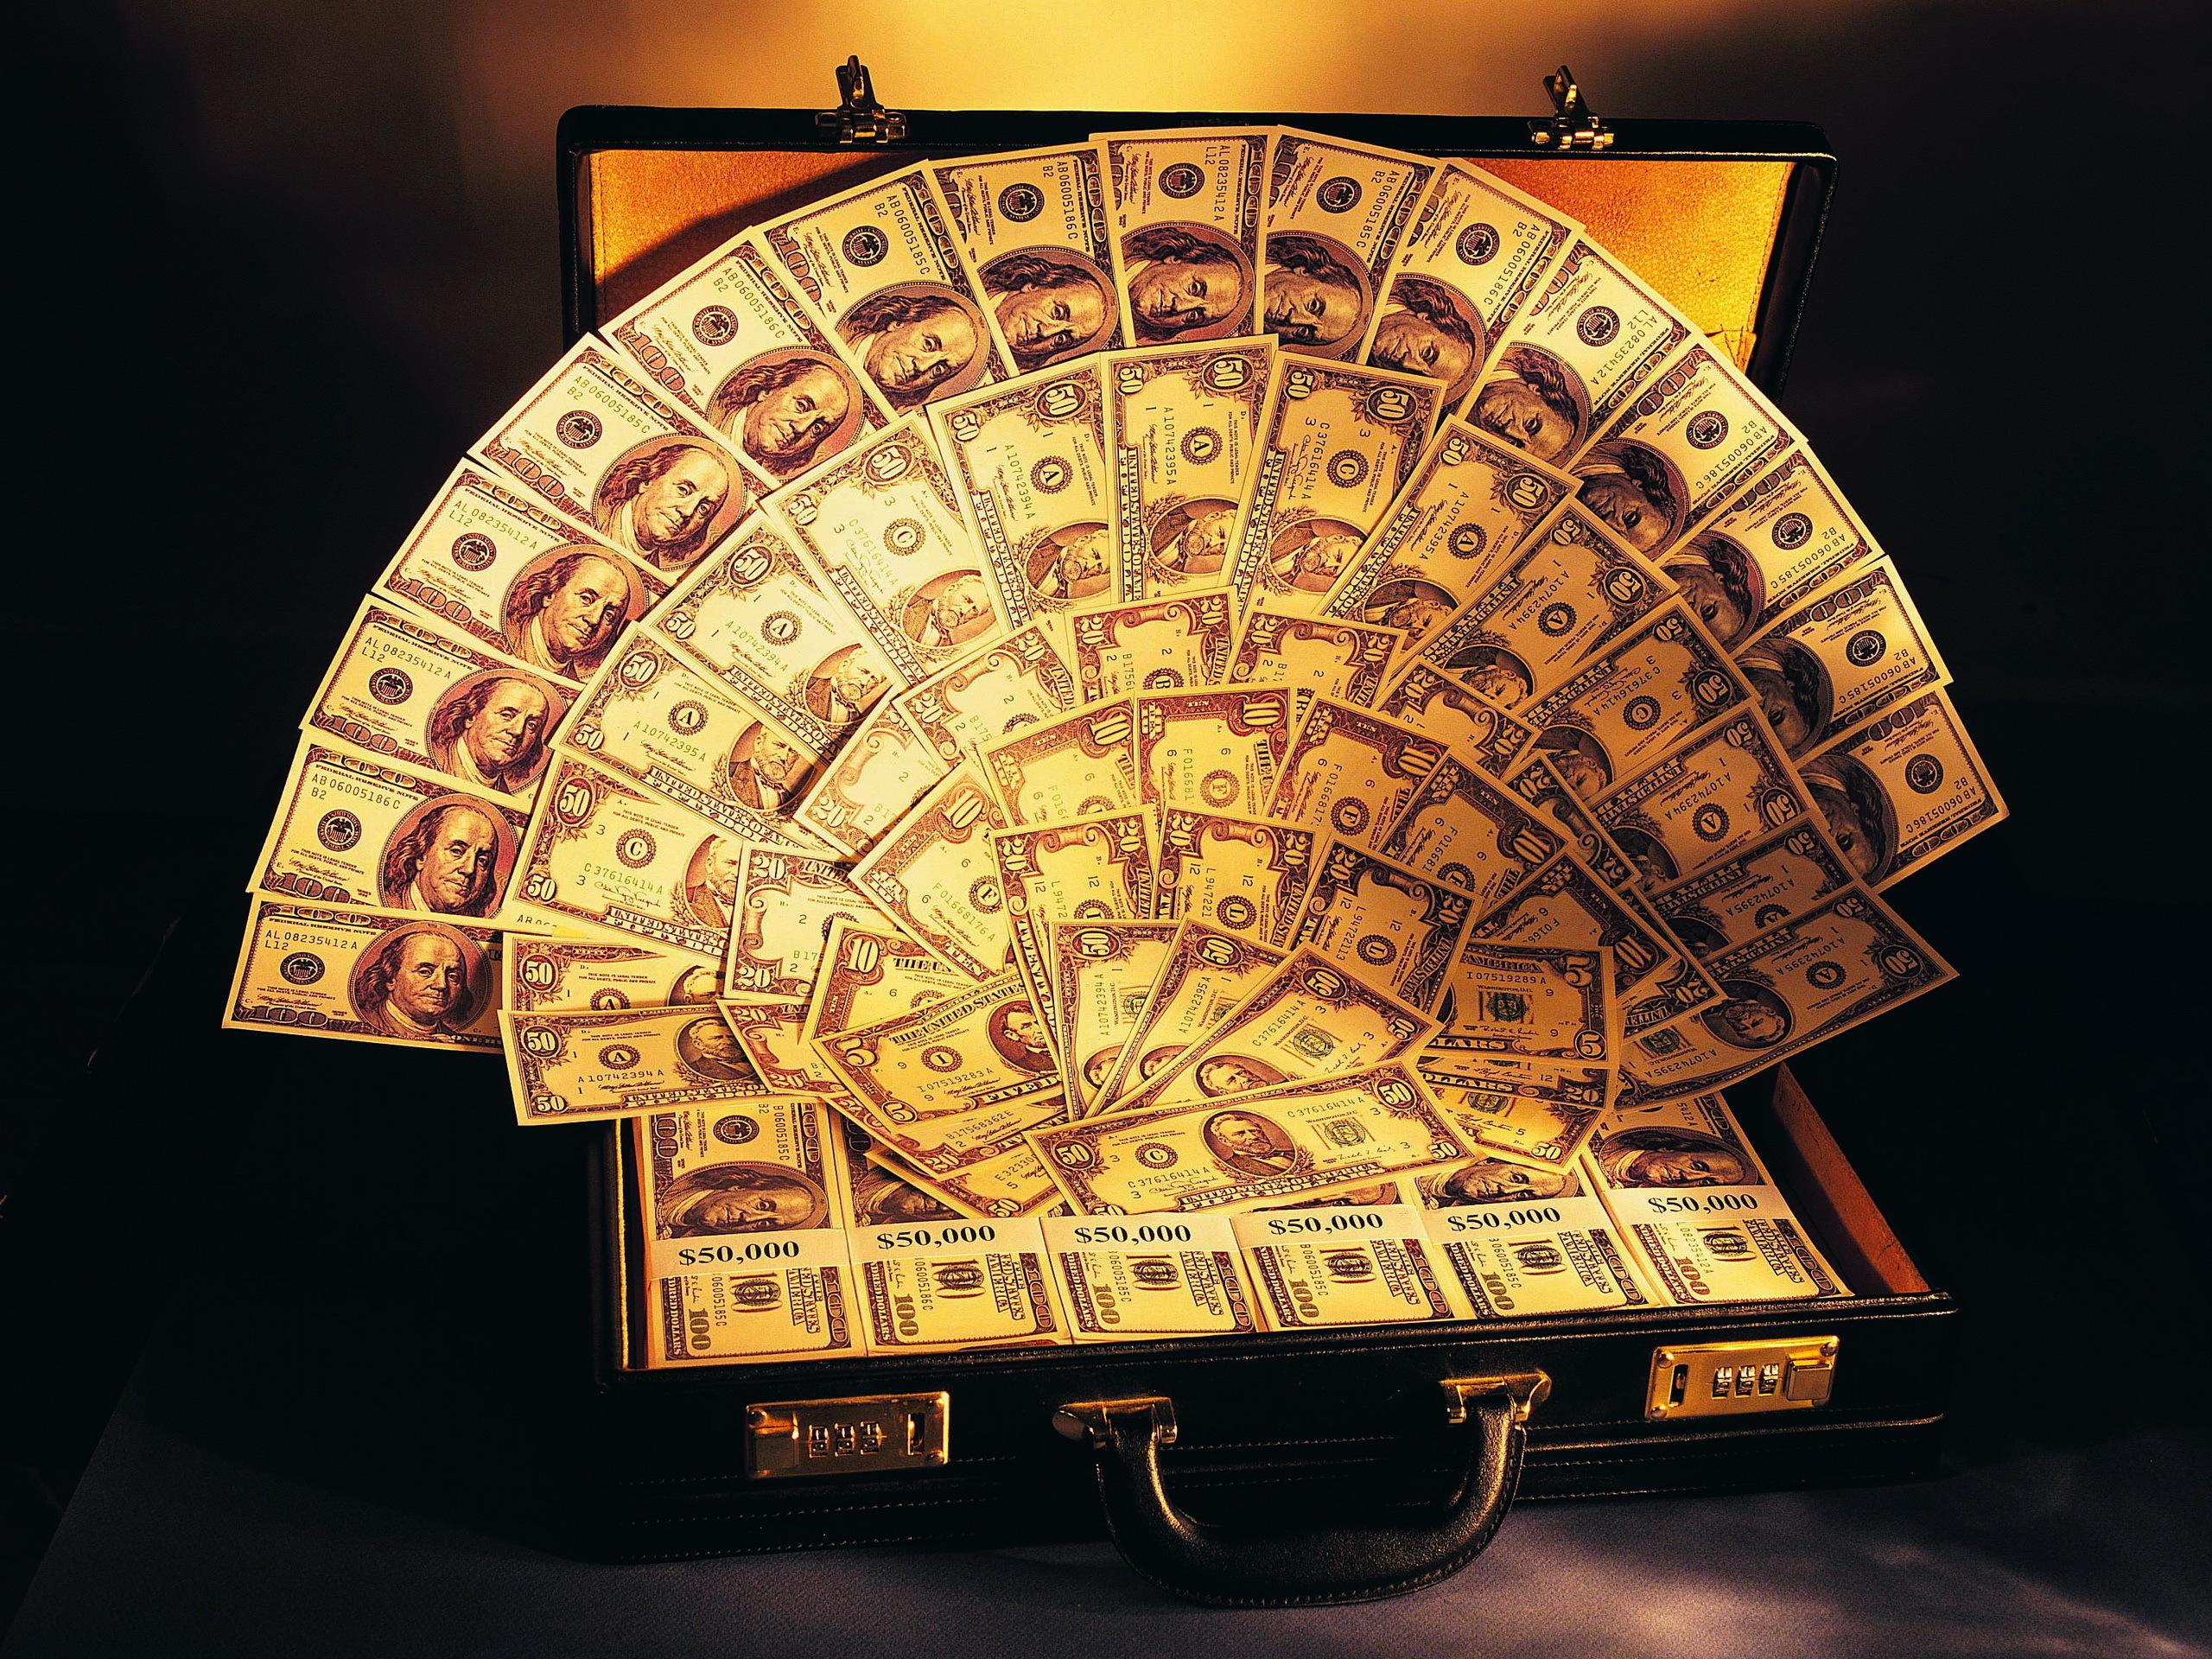 Money Desktop Wallpaper HD wallpaper background 2560x1920